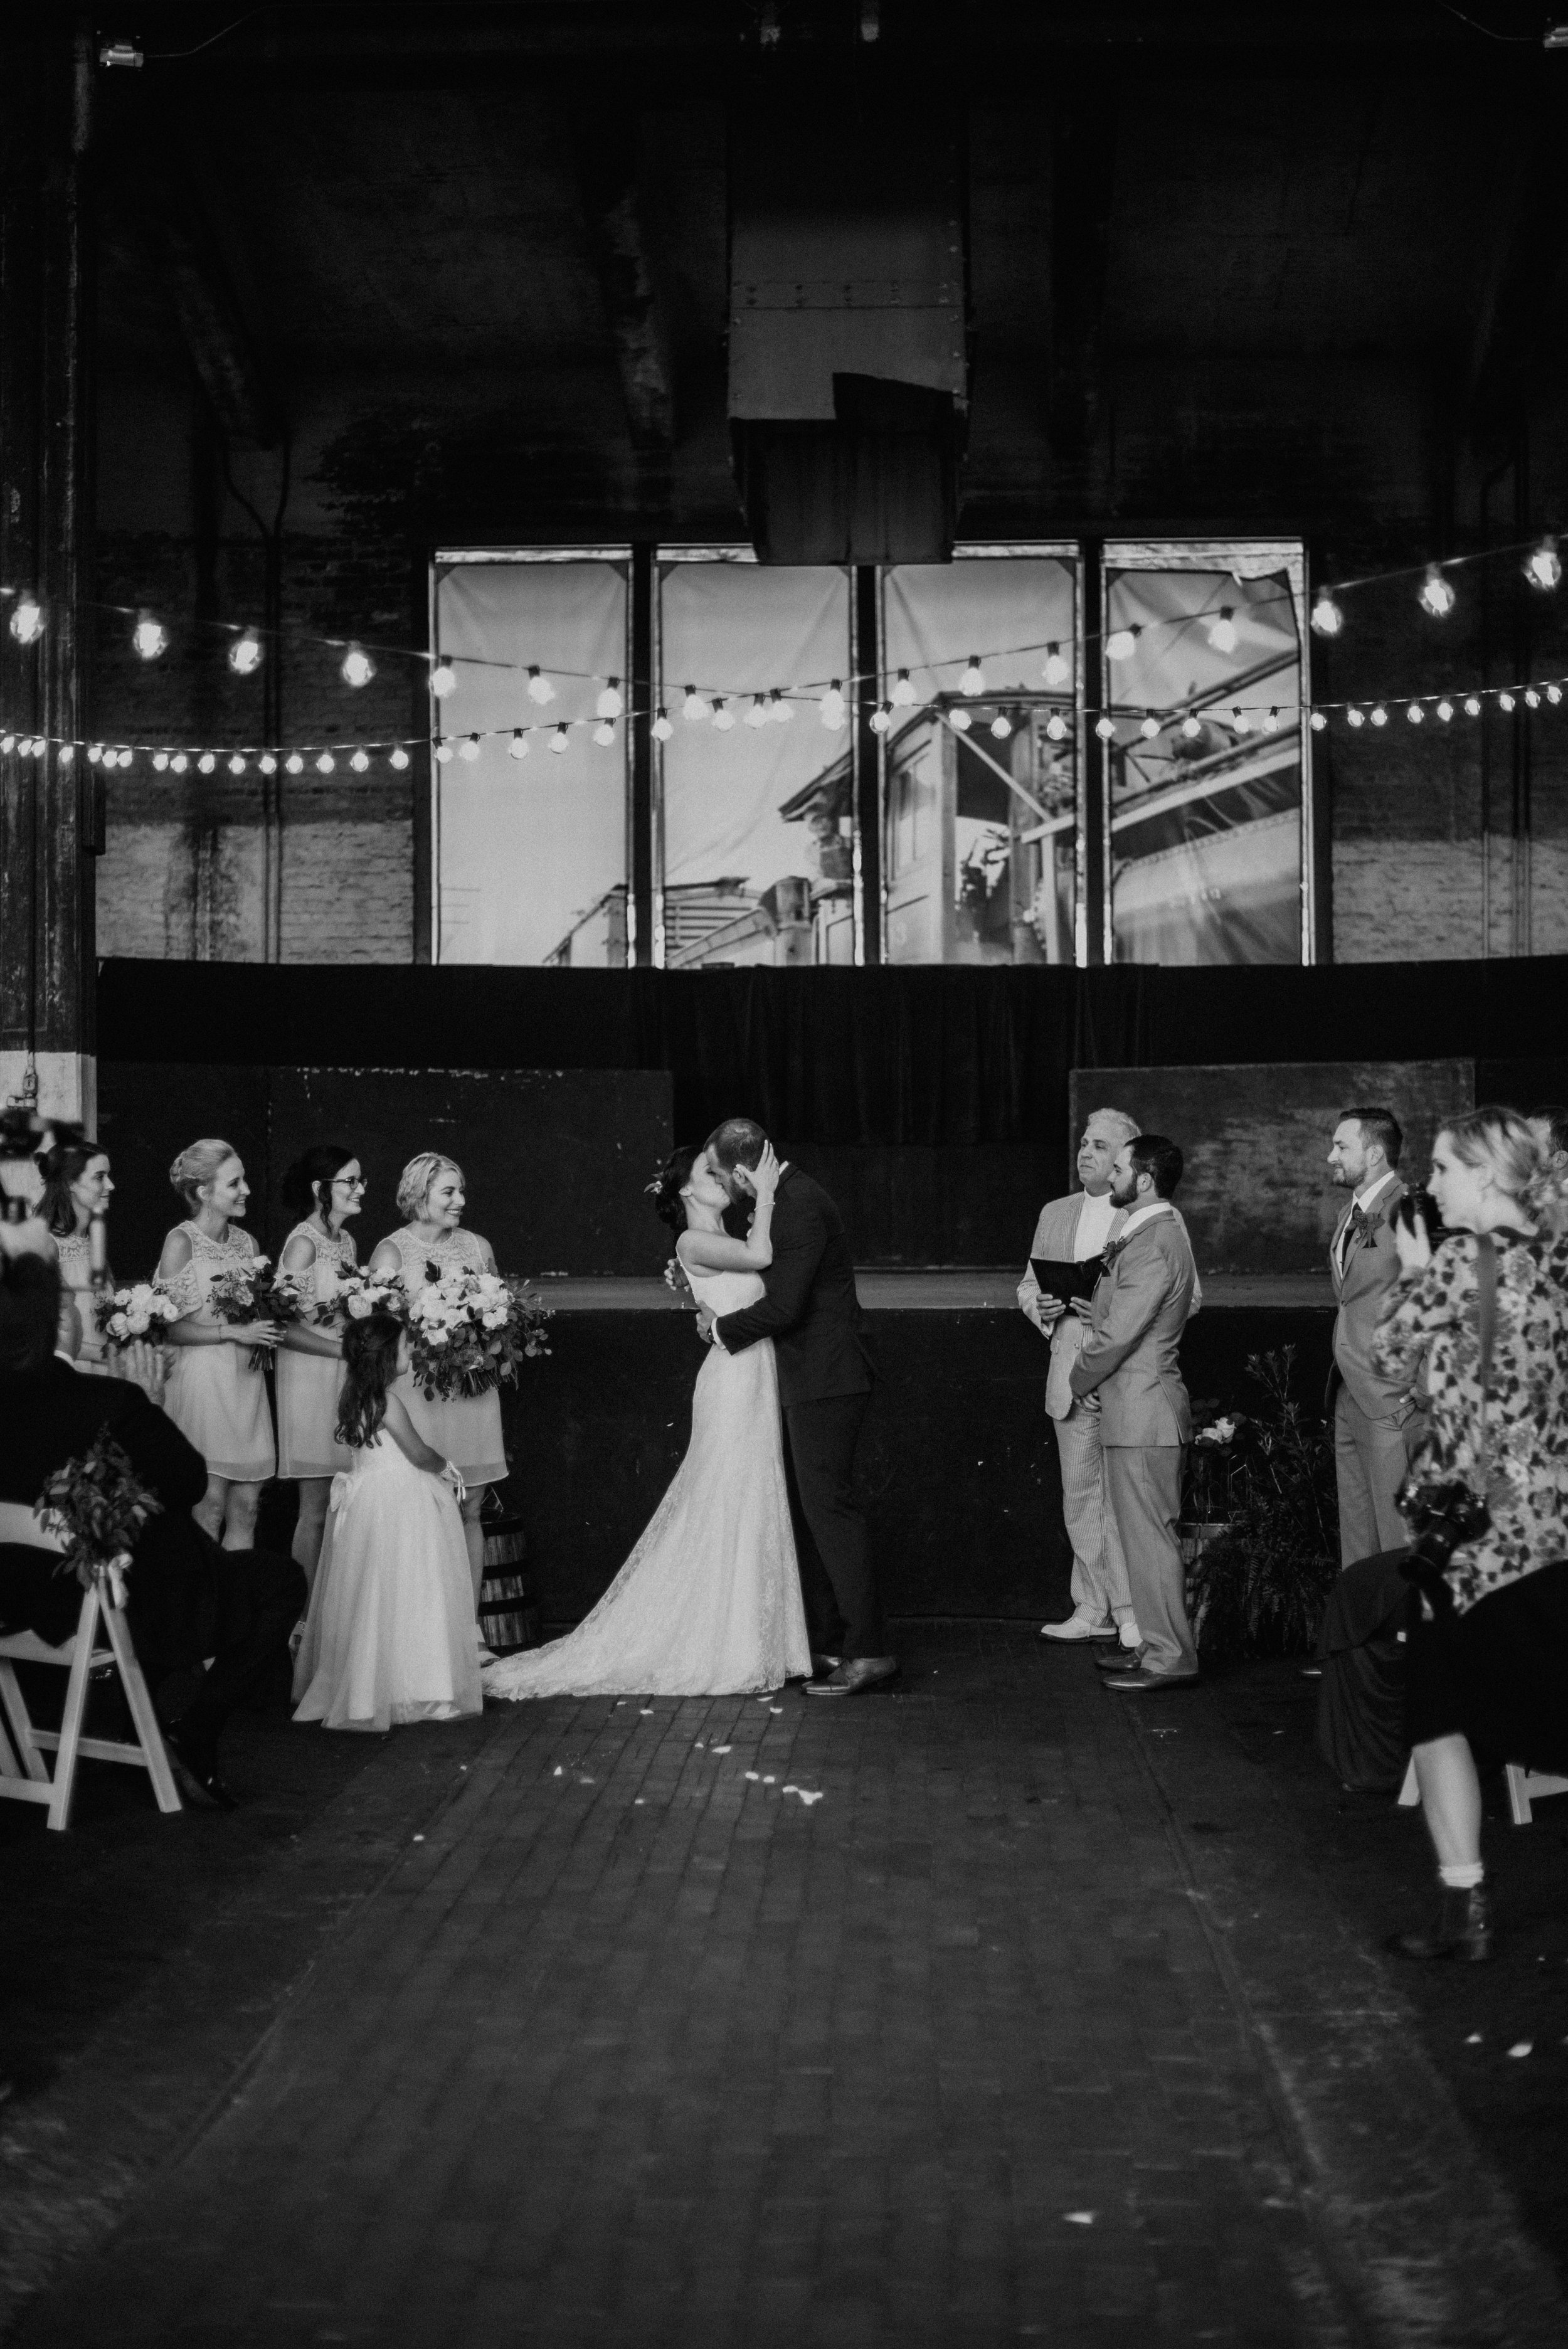 savannah-bridal-shop-andrea-and-mike-evergold-photography-georgia-state-railroad-museum-wedding-savannah-wedding-florist-savannah-wedding-planner-30.jpg